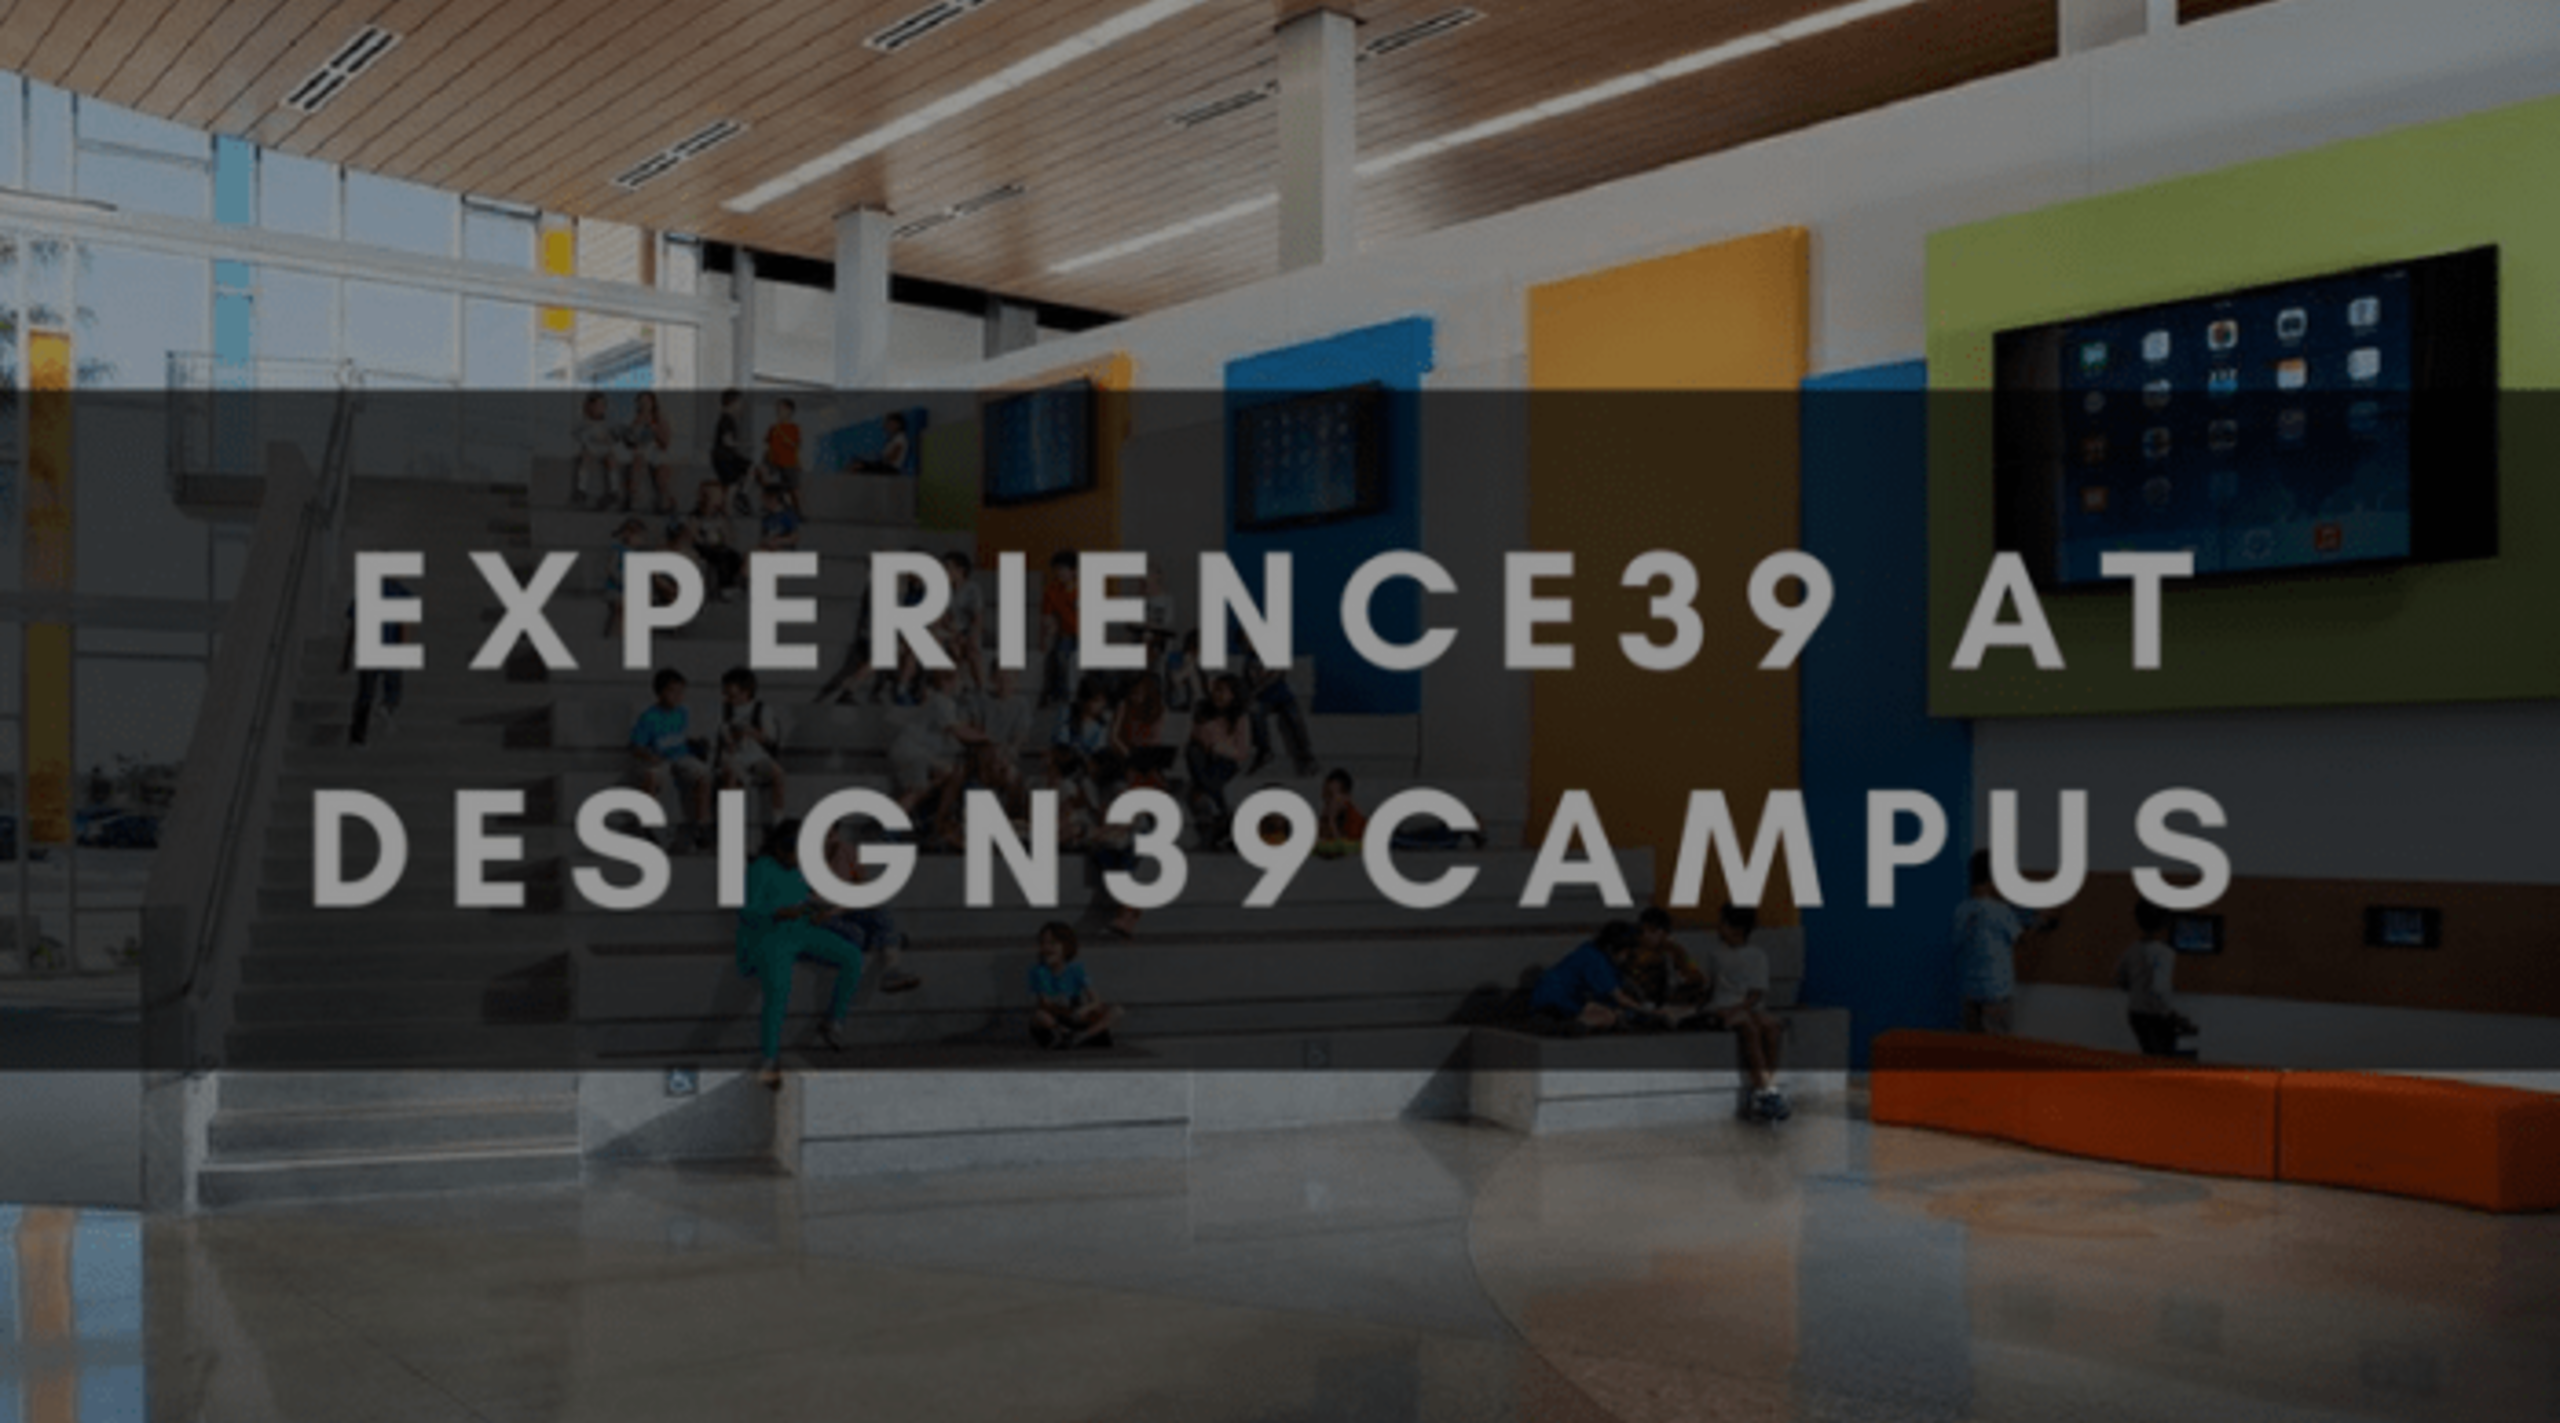 EXPERIENCE39 AT DESIGN39CAMPUS